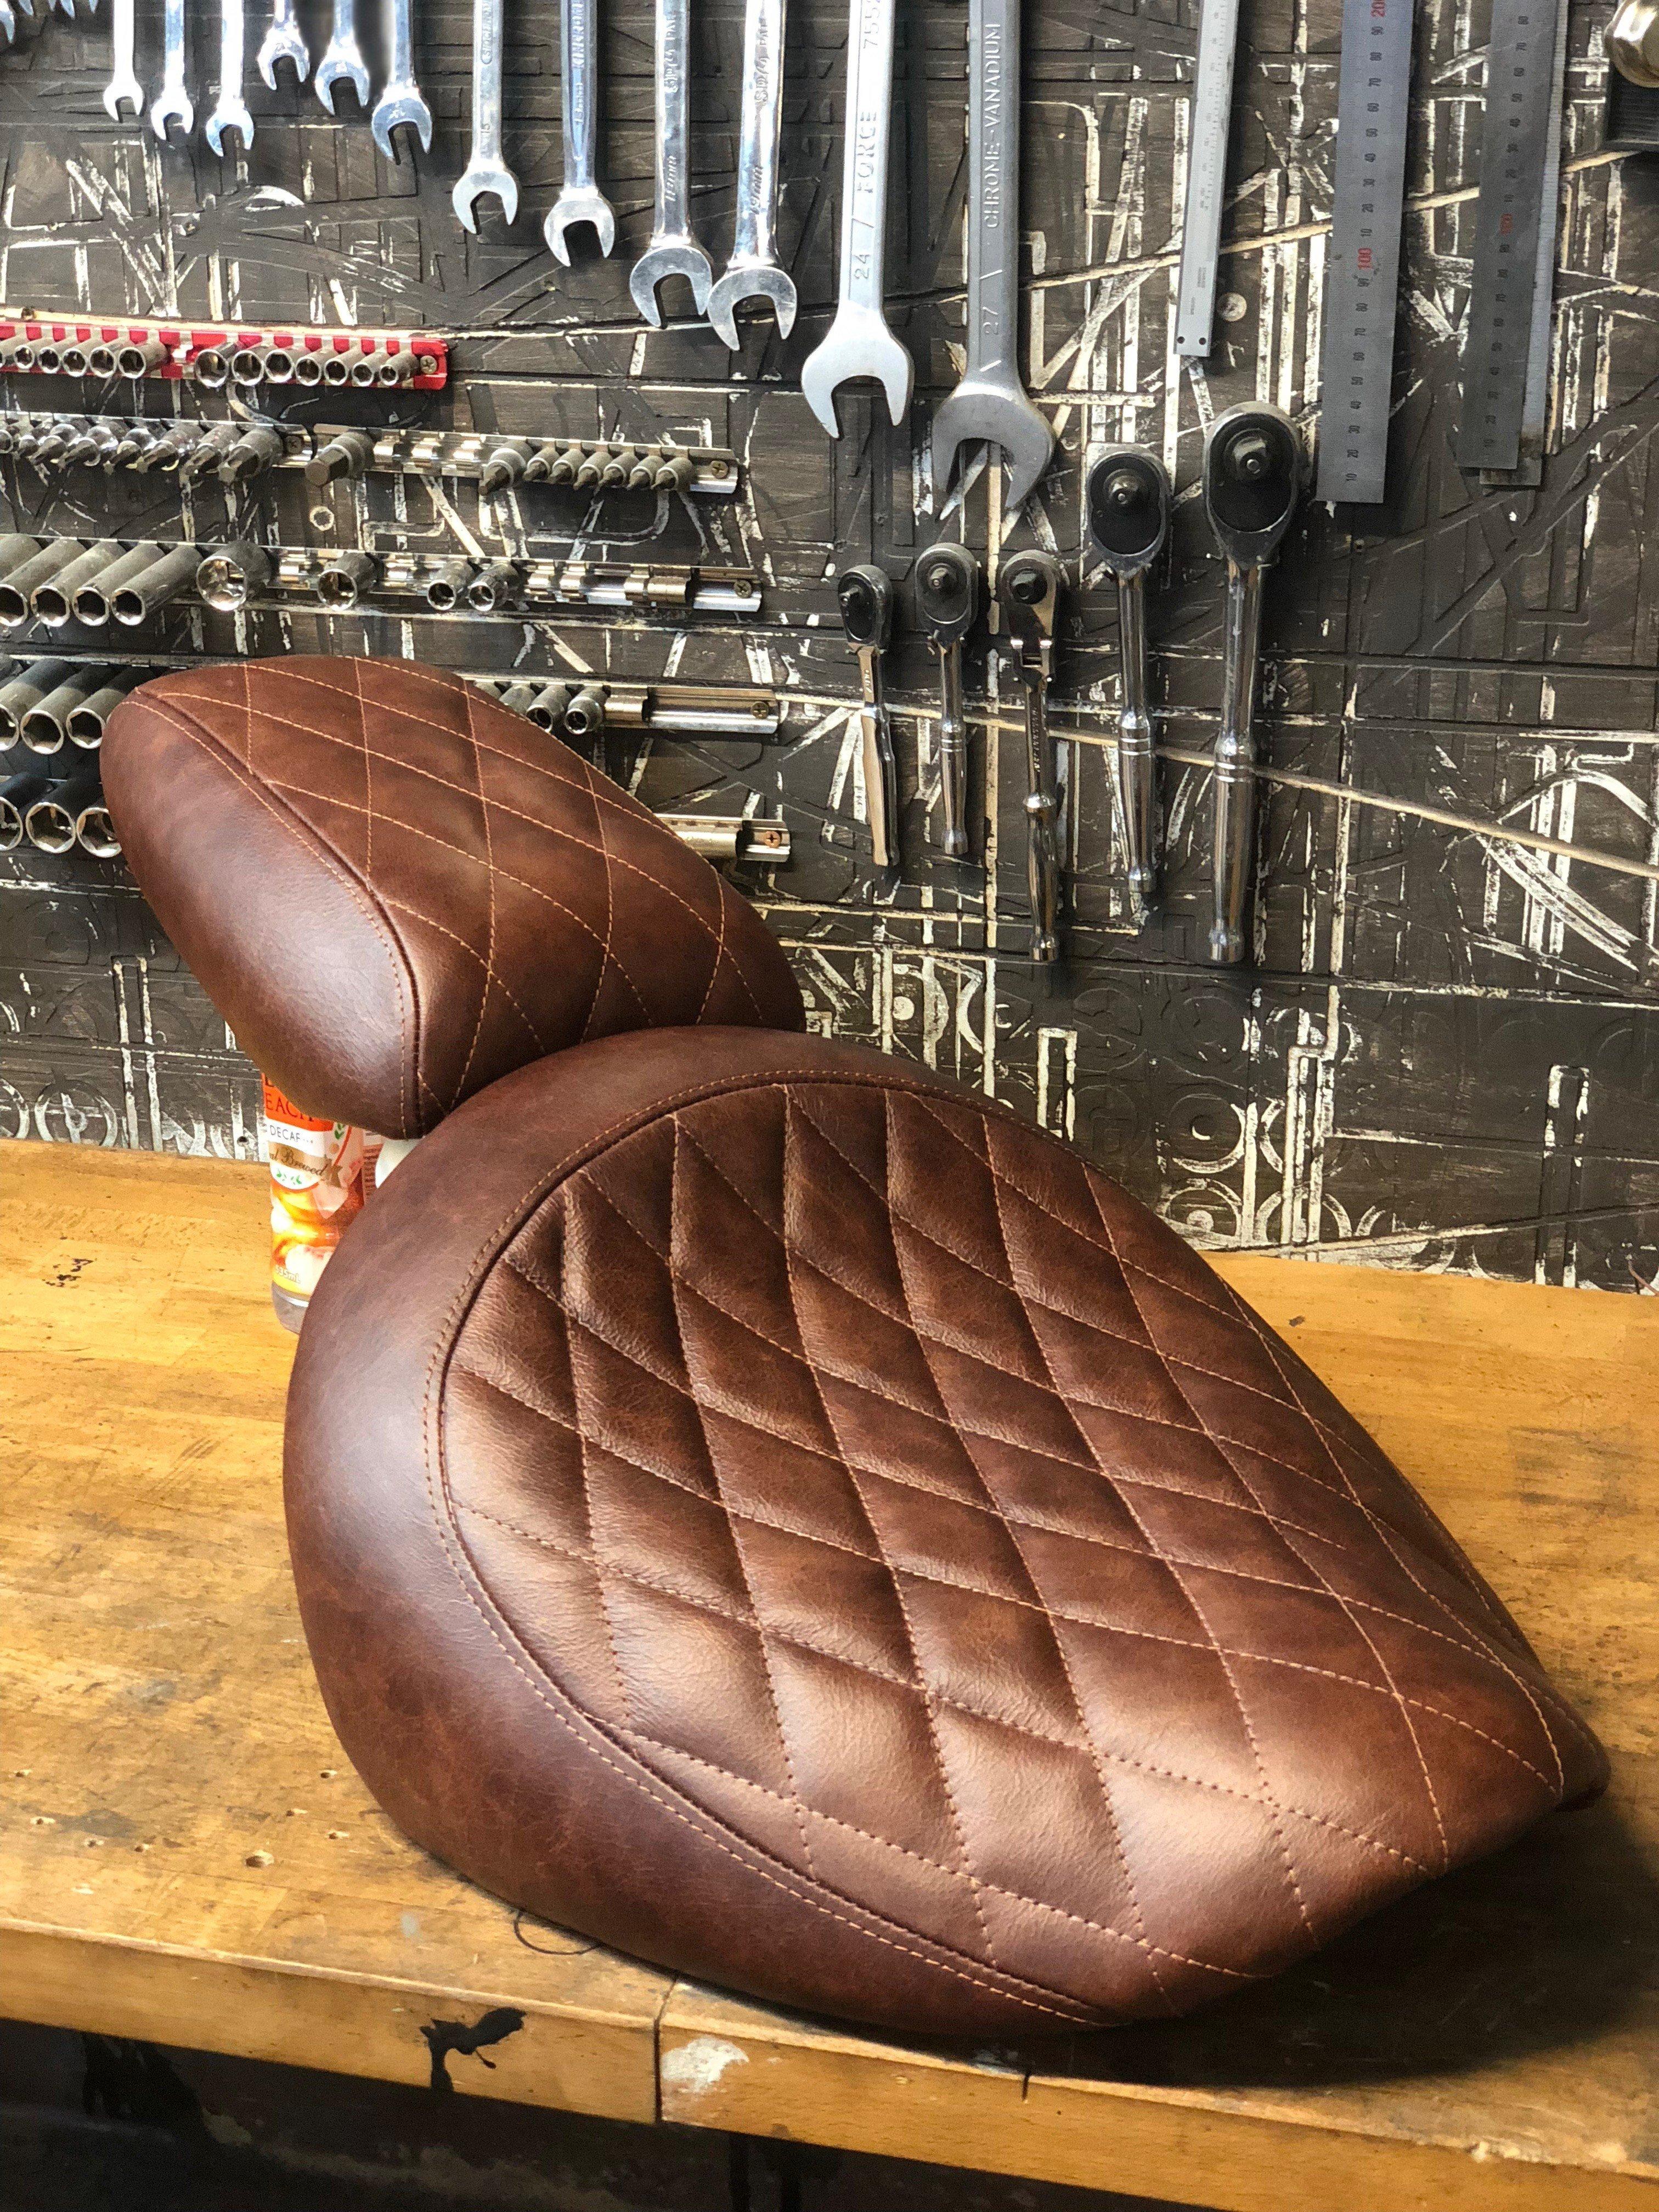 Tan leather seat Brown chopper seat